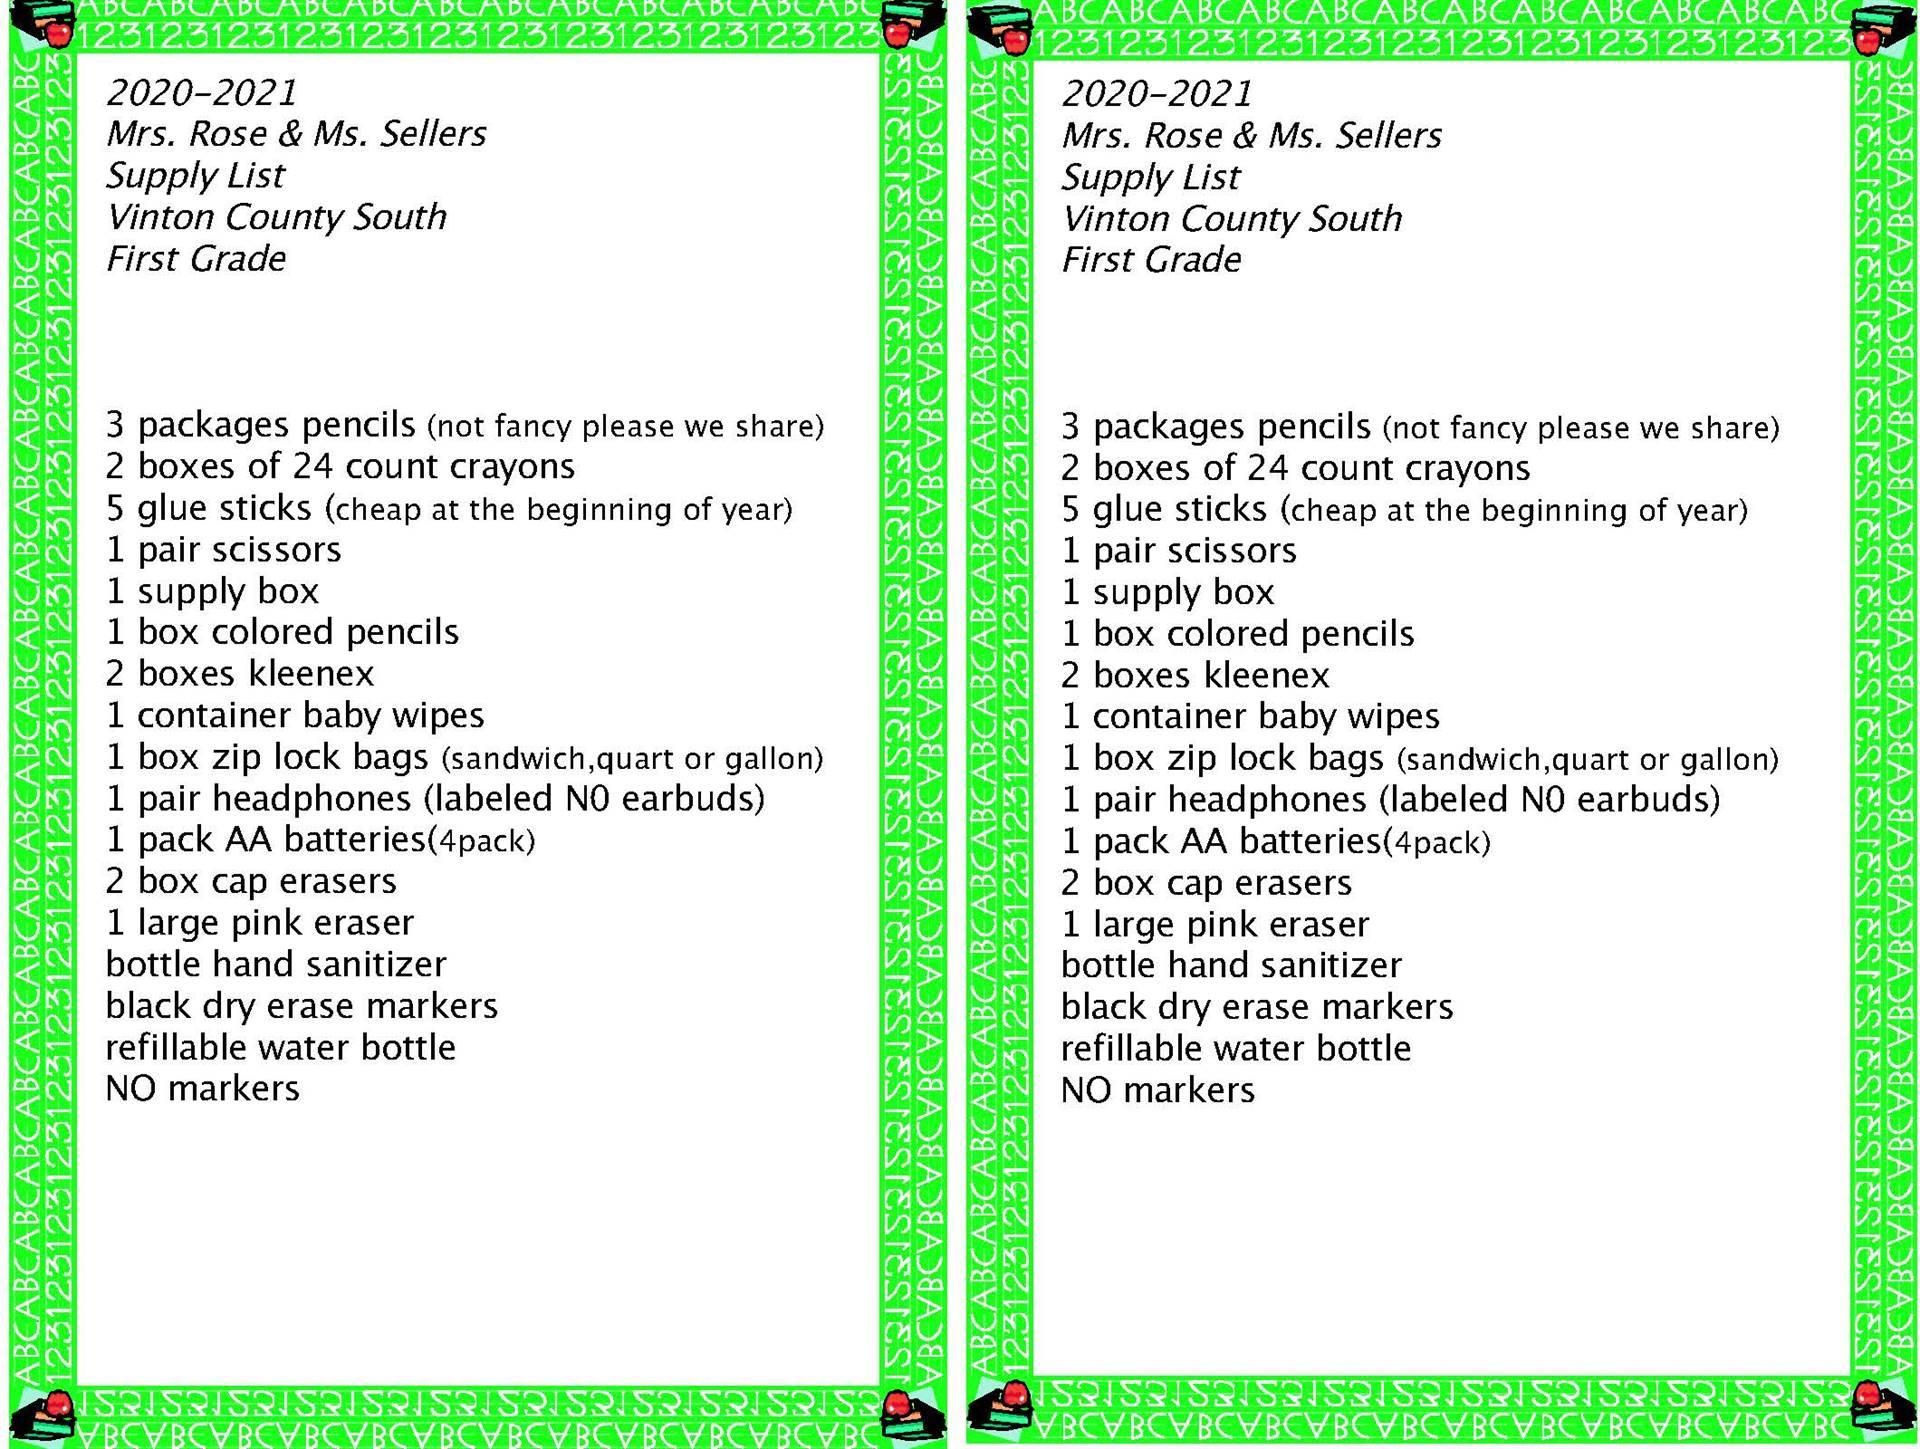 South First Grade Supply List